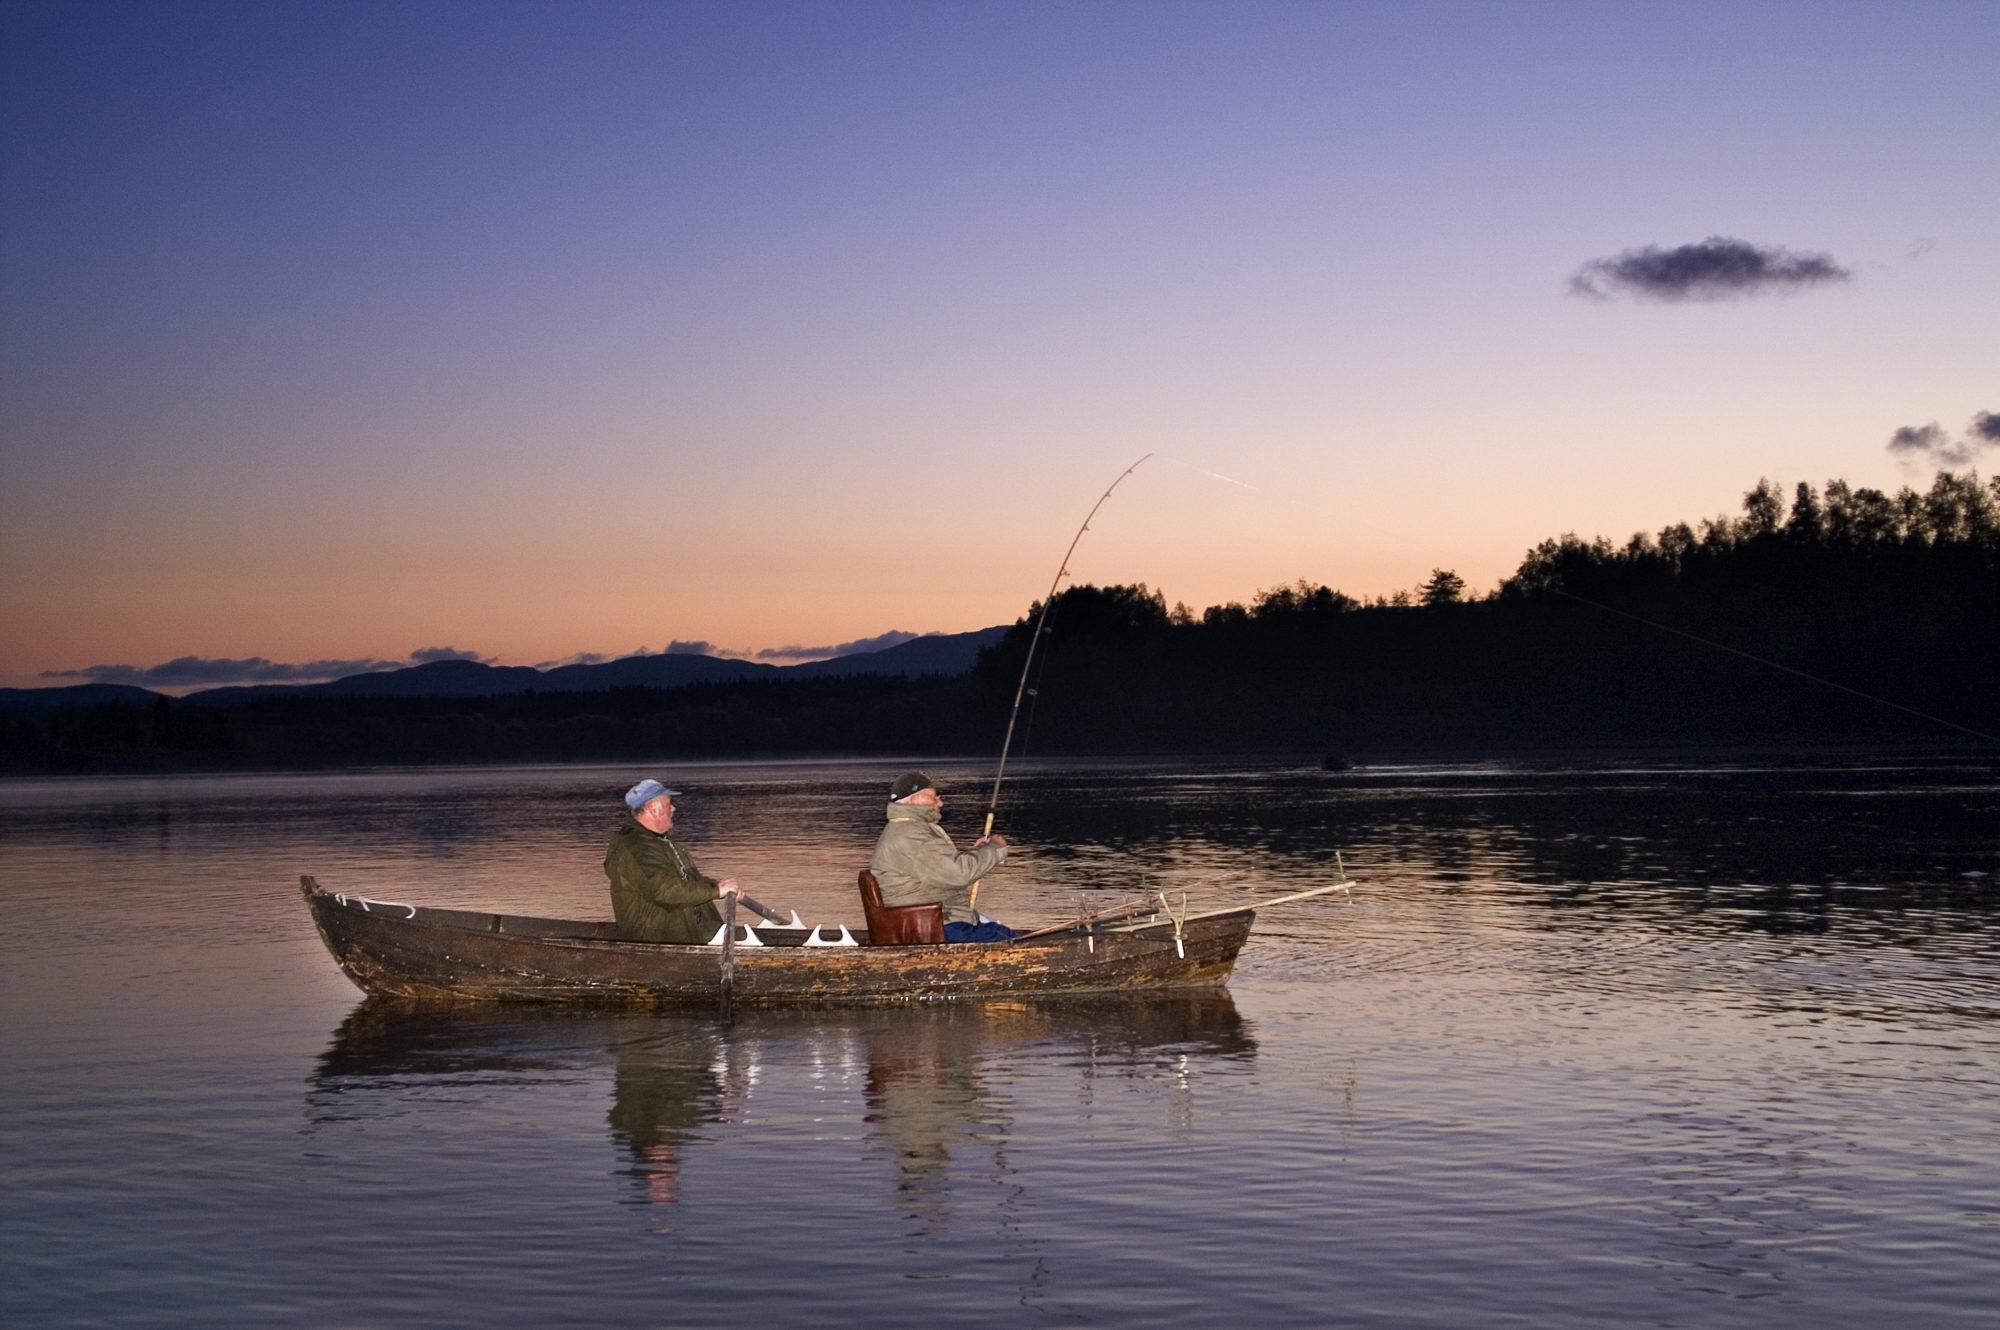 Laksefiske i Namsen. Foto: Steinar Johansen